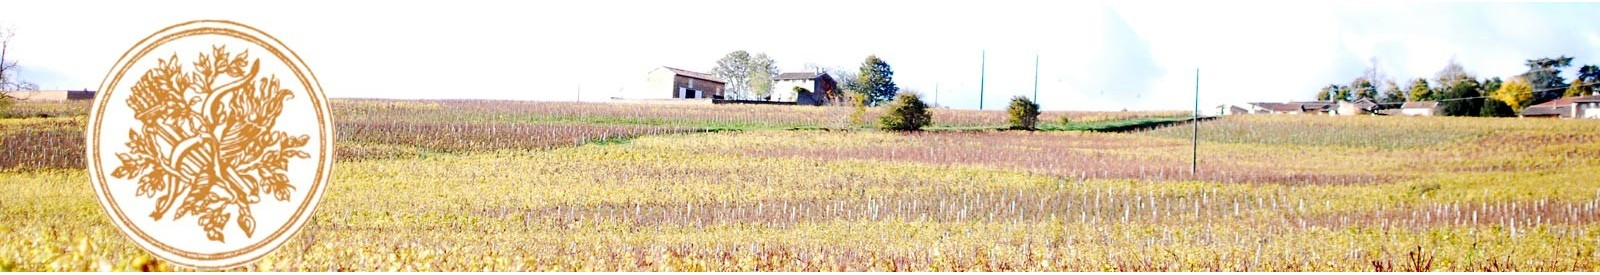 Domaine Chardigny - Saint-Véran - Organic wine